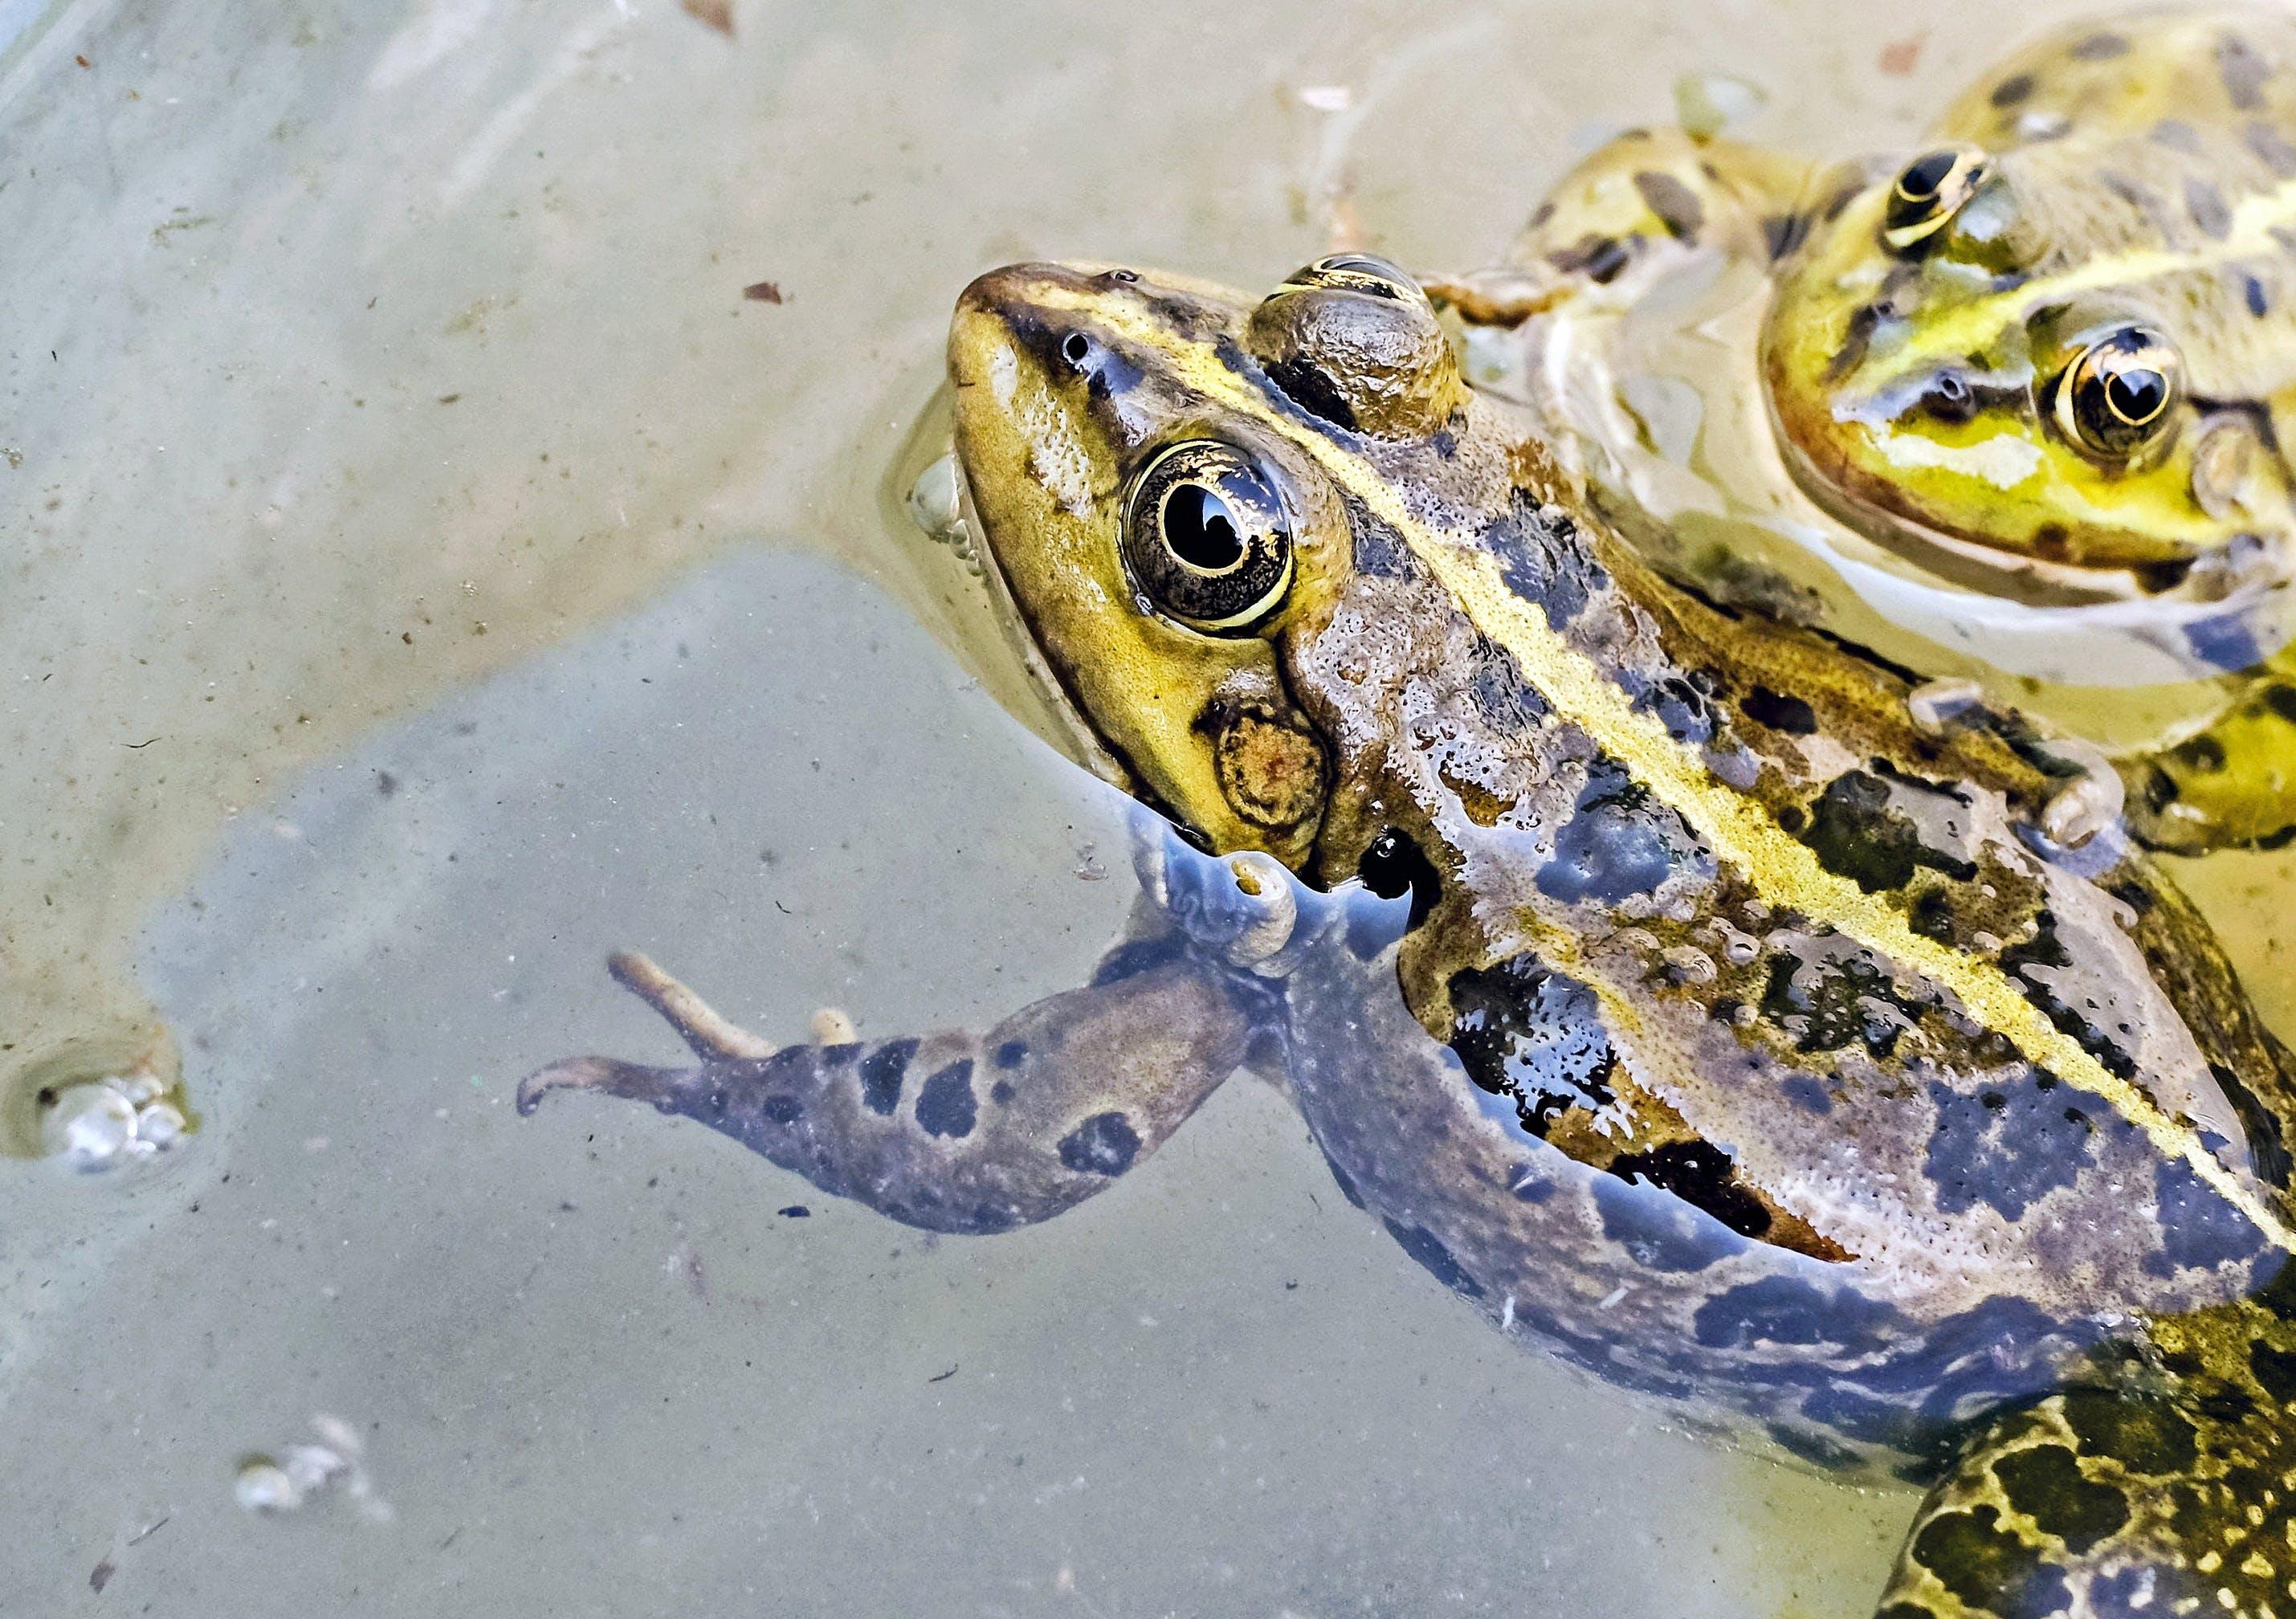 amphibians, animal photography, animals